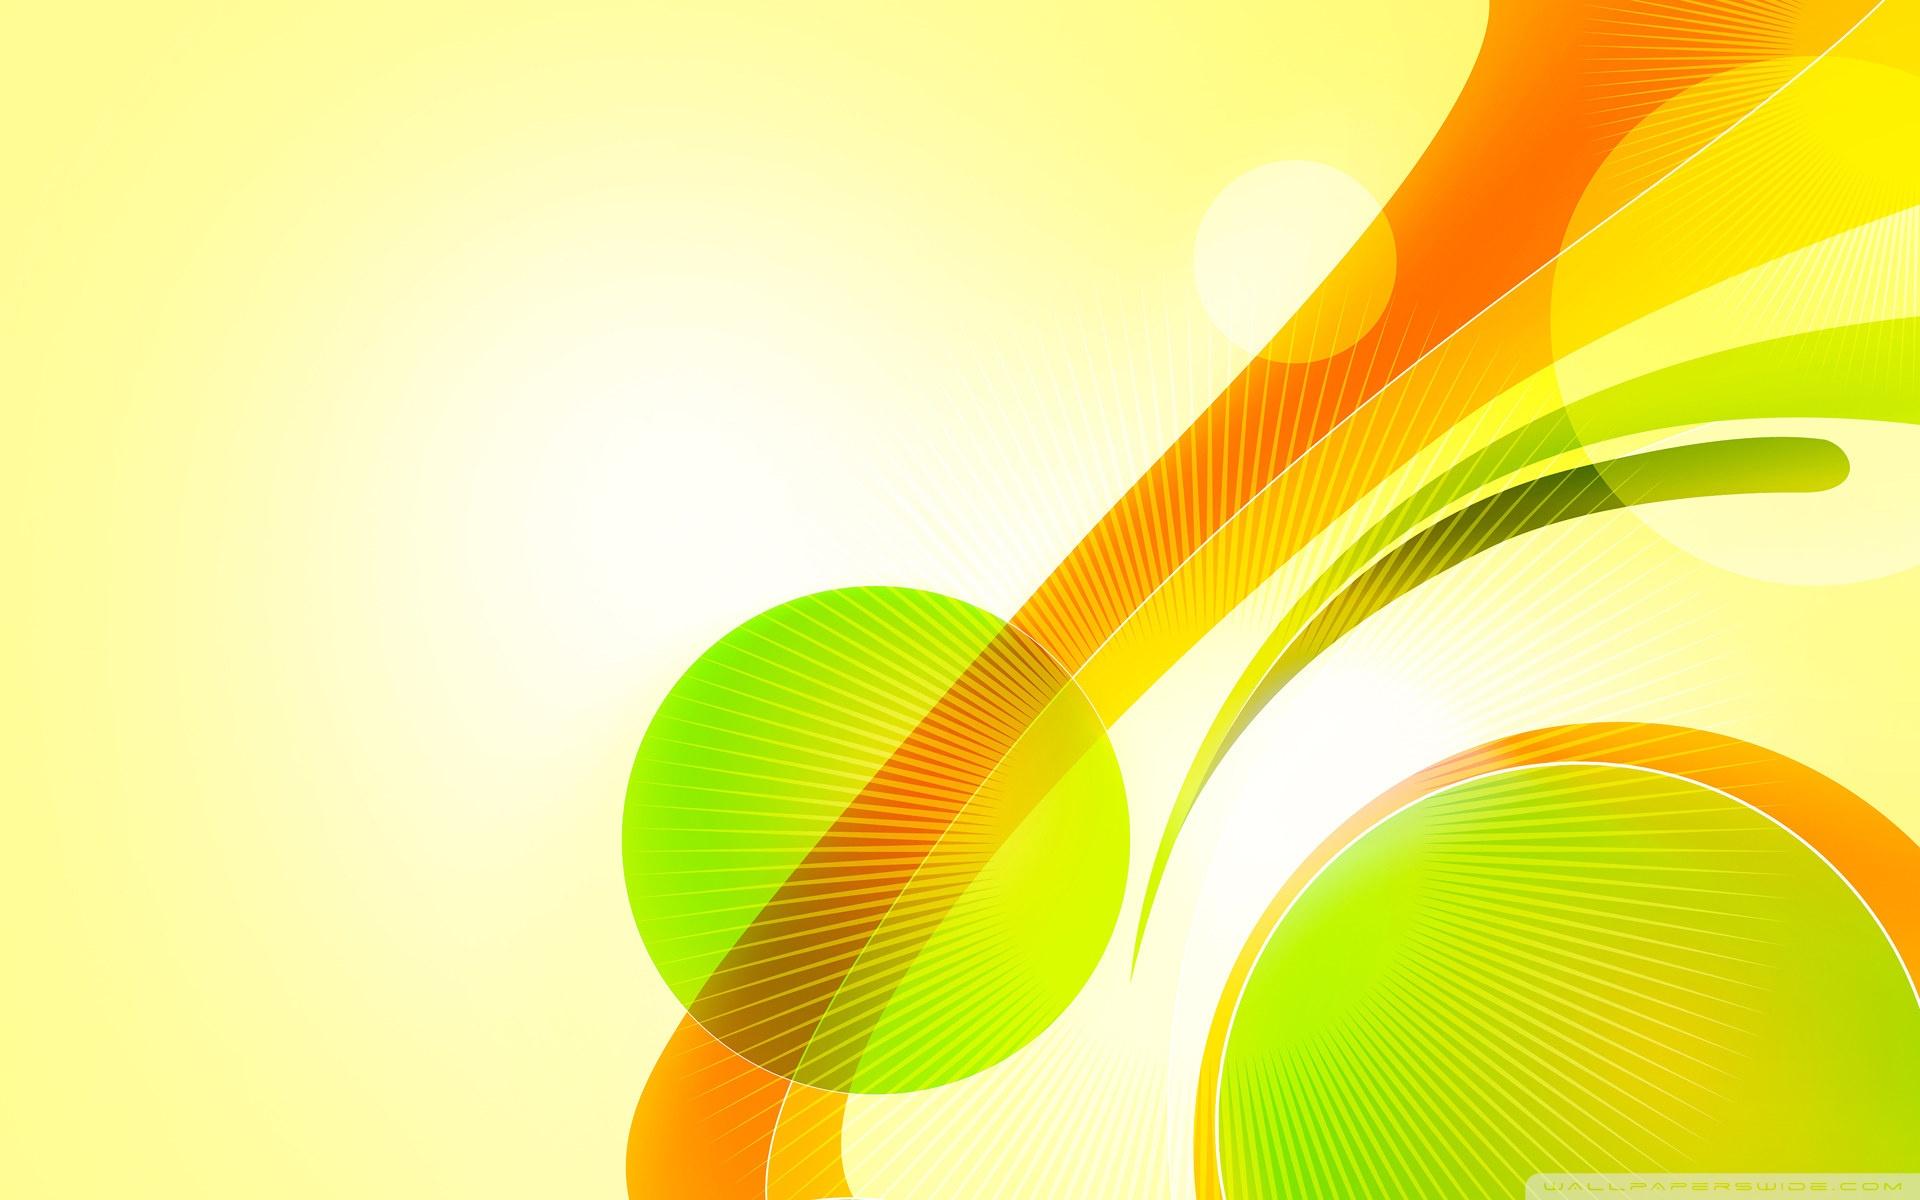 Abstract Colors 2 HD desktop wallpaper : High Definition